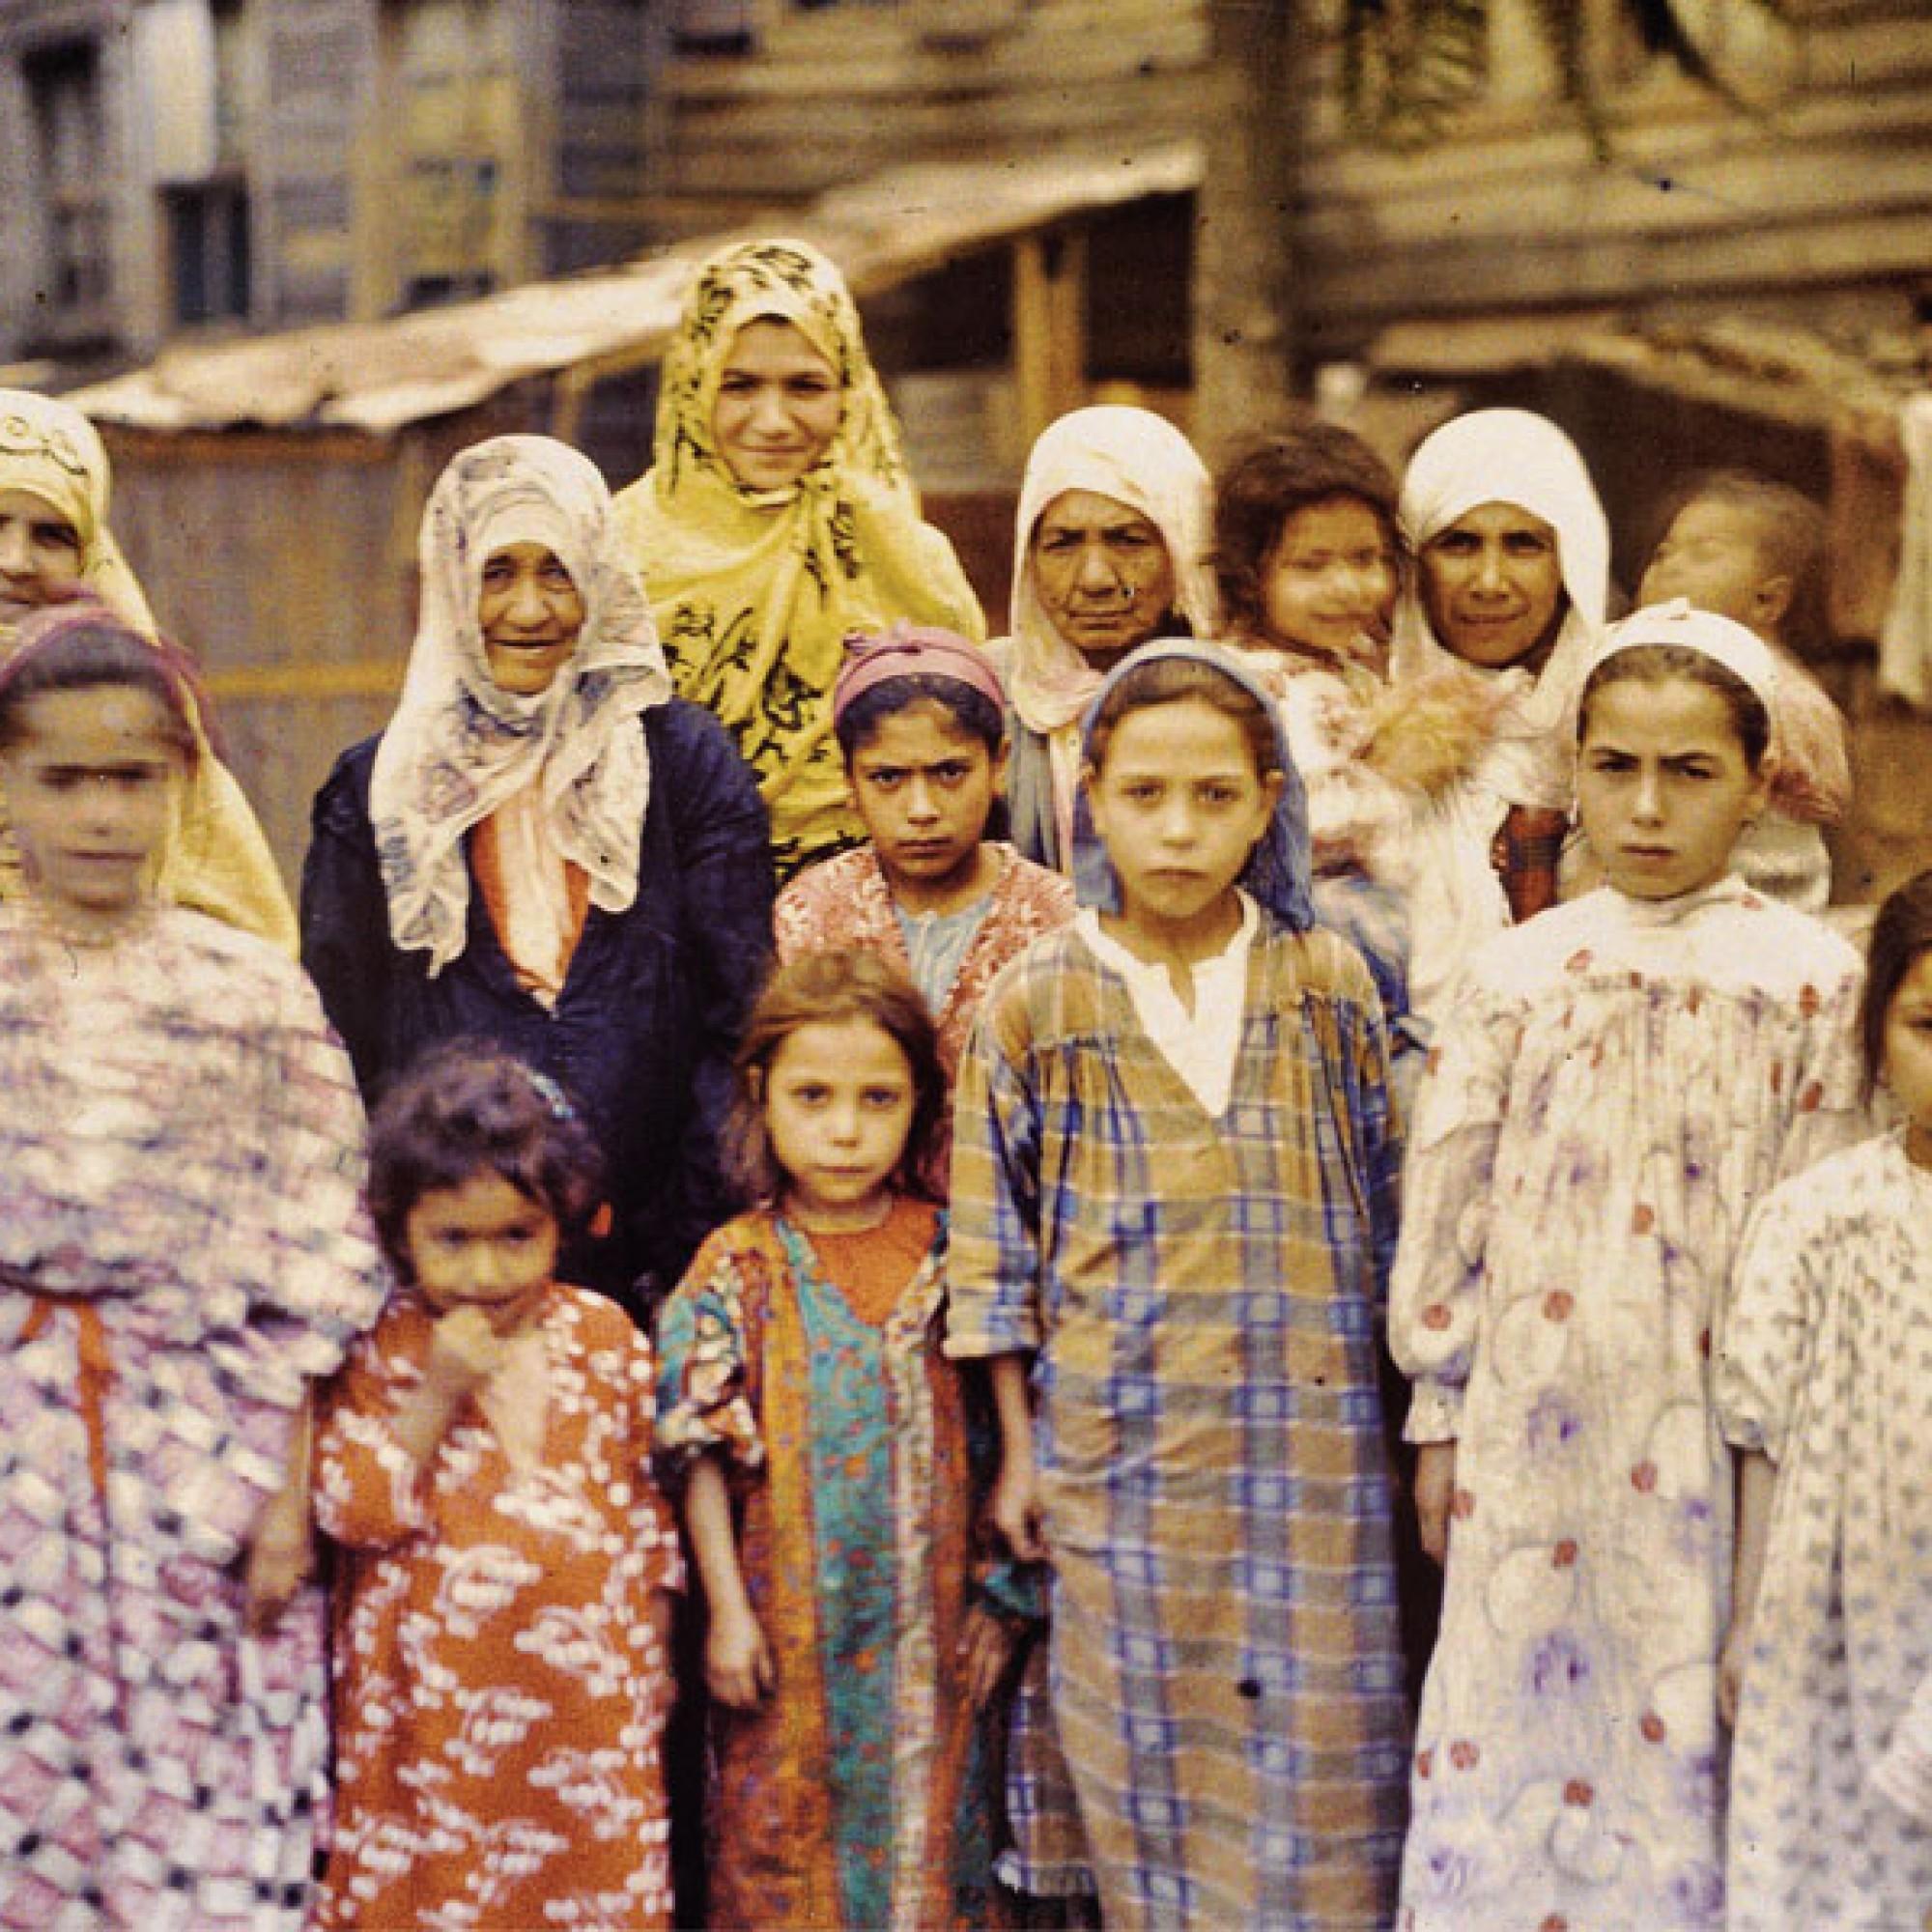 Stéphane Passet, Türkei, Istanbul, Gruppe armenischer Frauen und Mädchen Albert Kahn, September 1912.  (Musée Albert-Kahn, Département des Hauts-de-Seine)